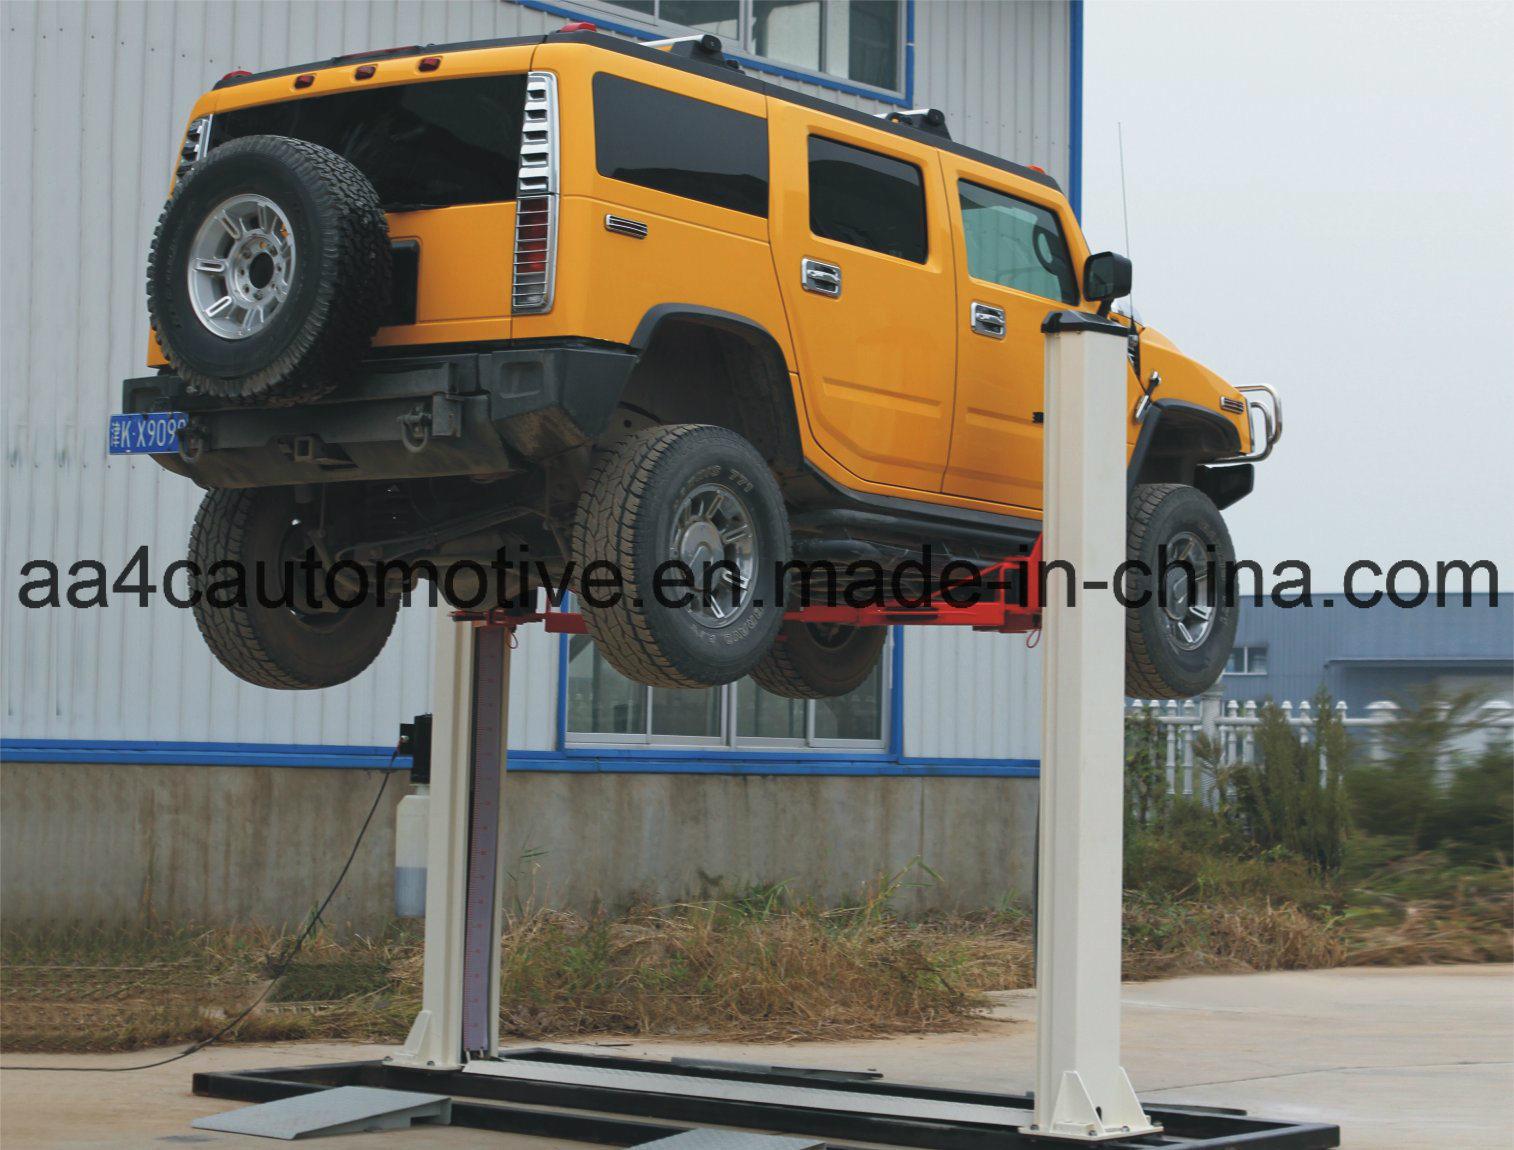 8 Fold Post Floor Plate 2 Post Car Lift